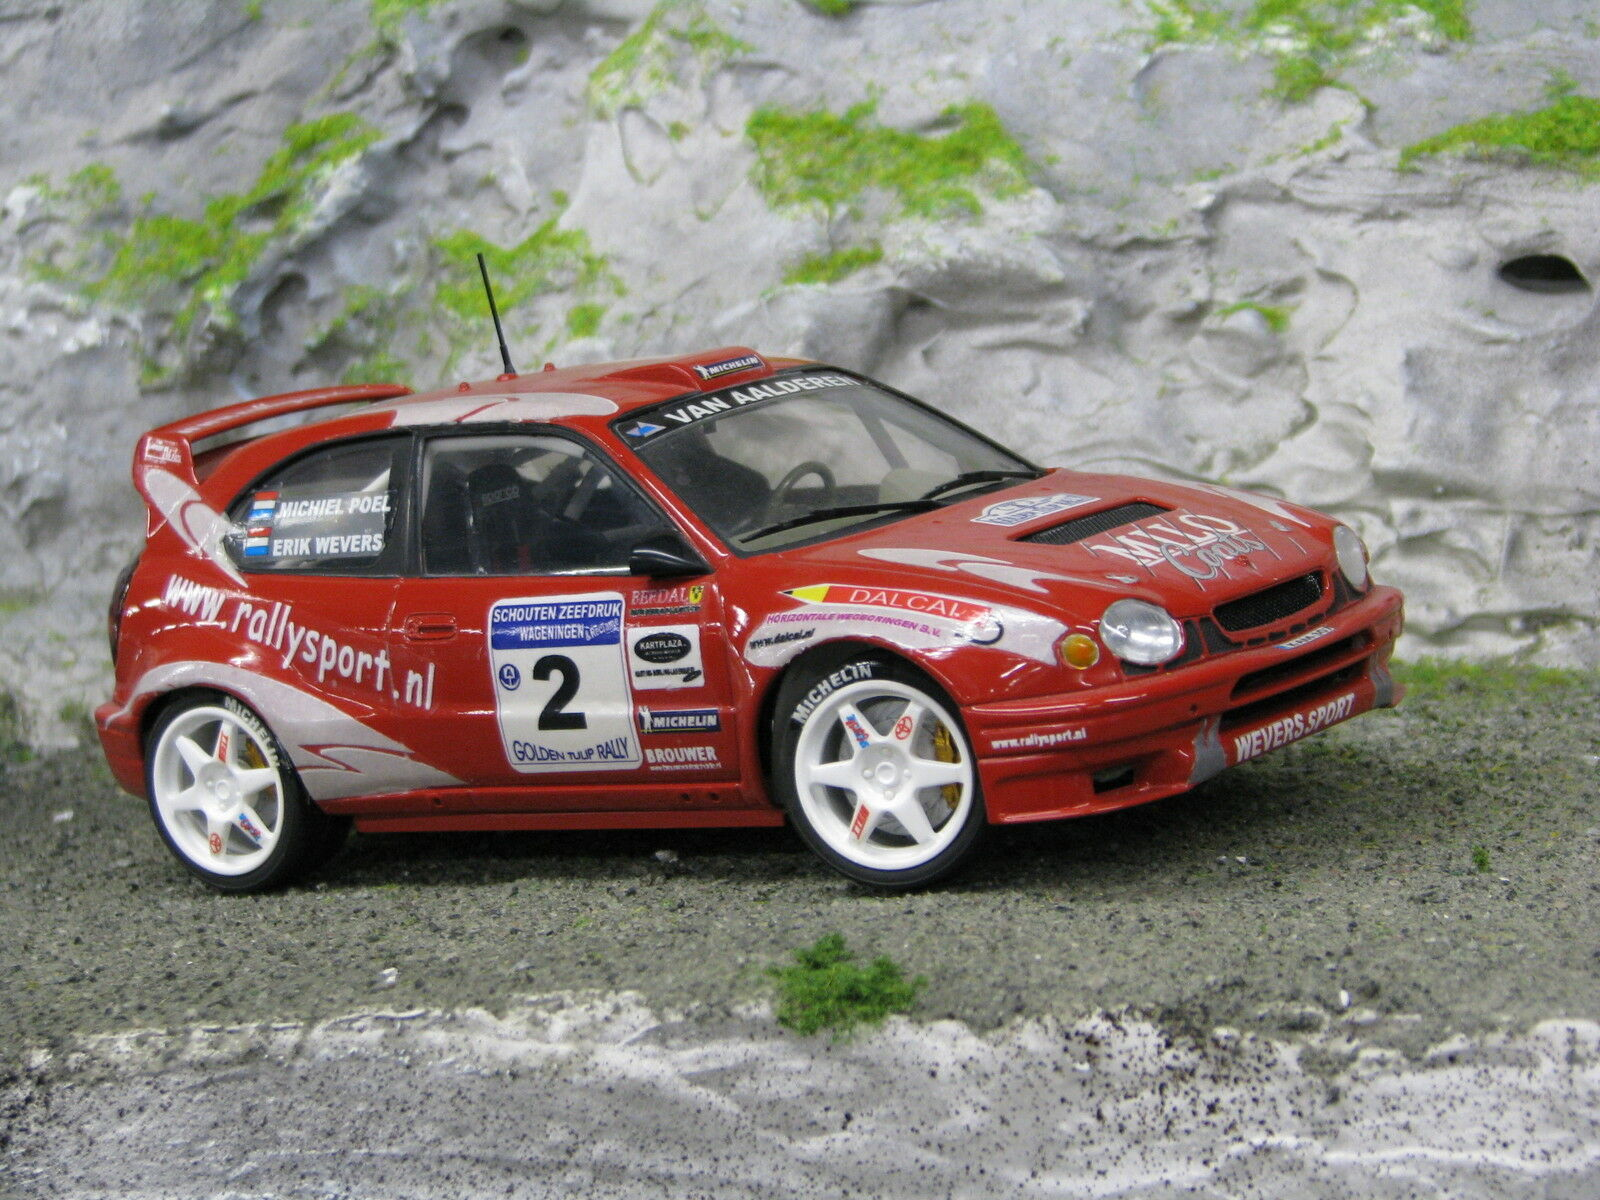 QSP Toyota Corolla WRC 1 24  1 Wevers   Poel oroen Tulip Rally 2002